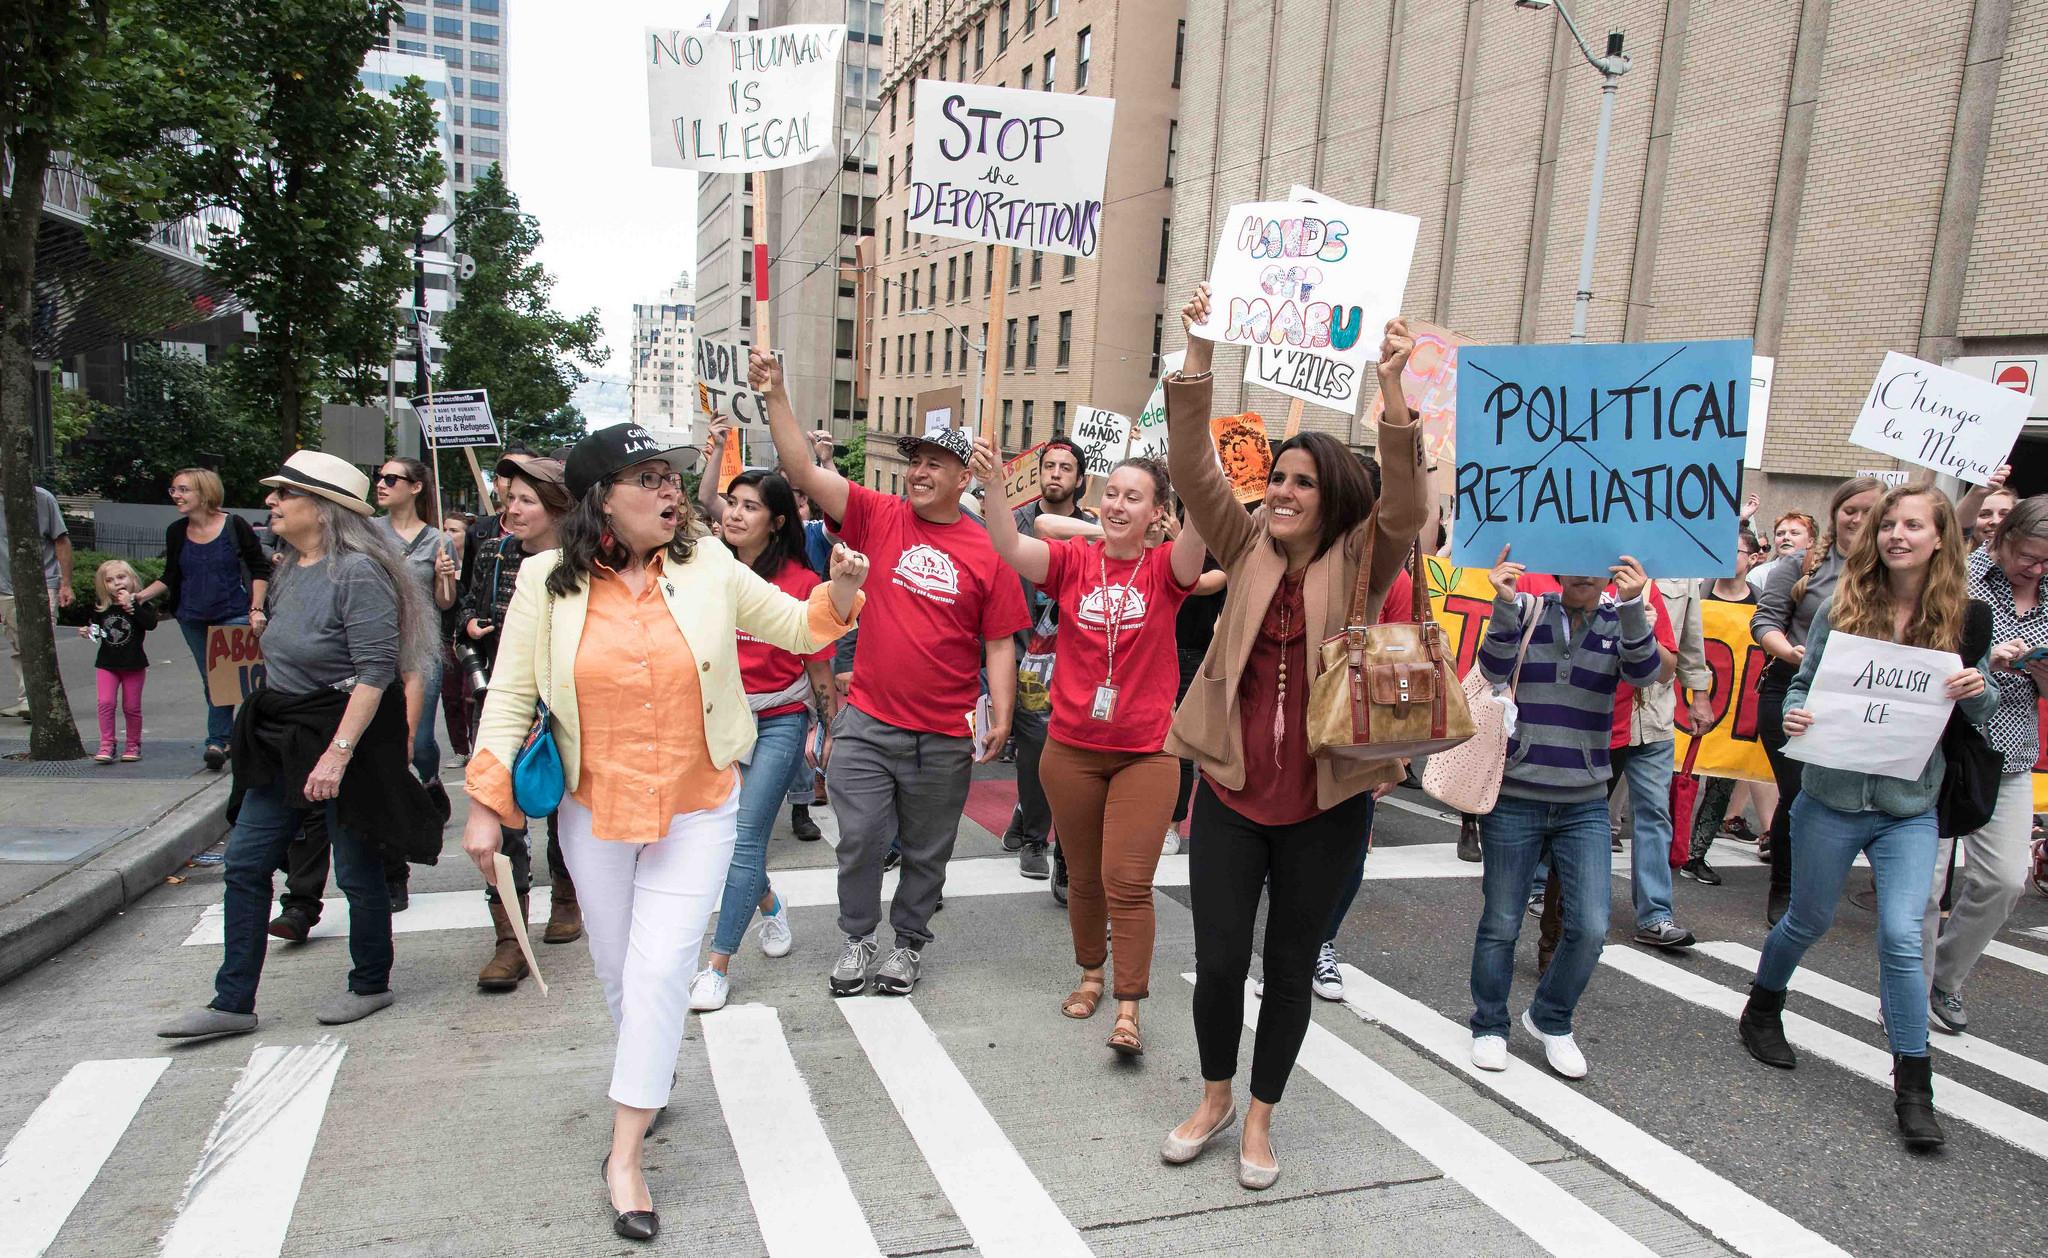 Seattle rallies unite against ICE deportations, Muslim ban